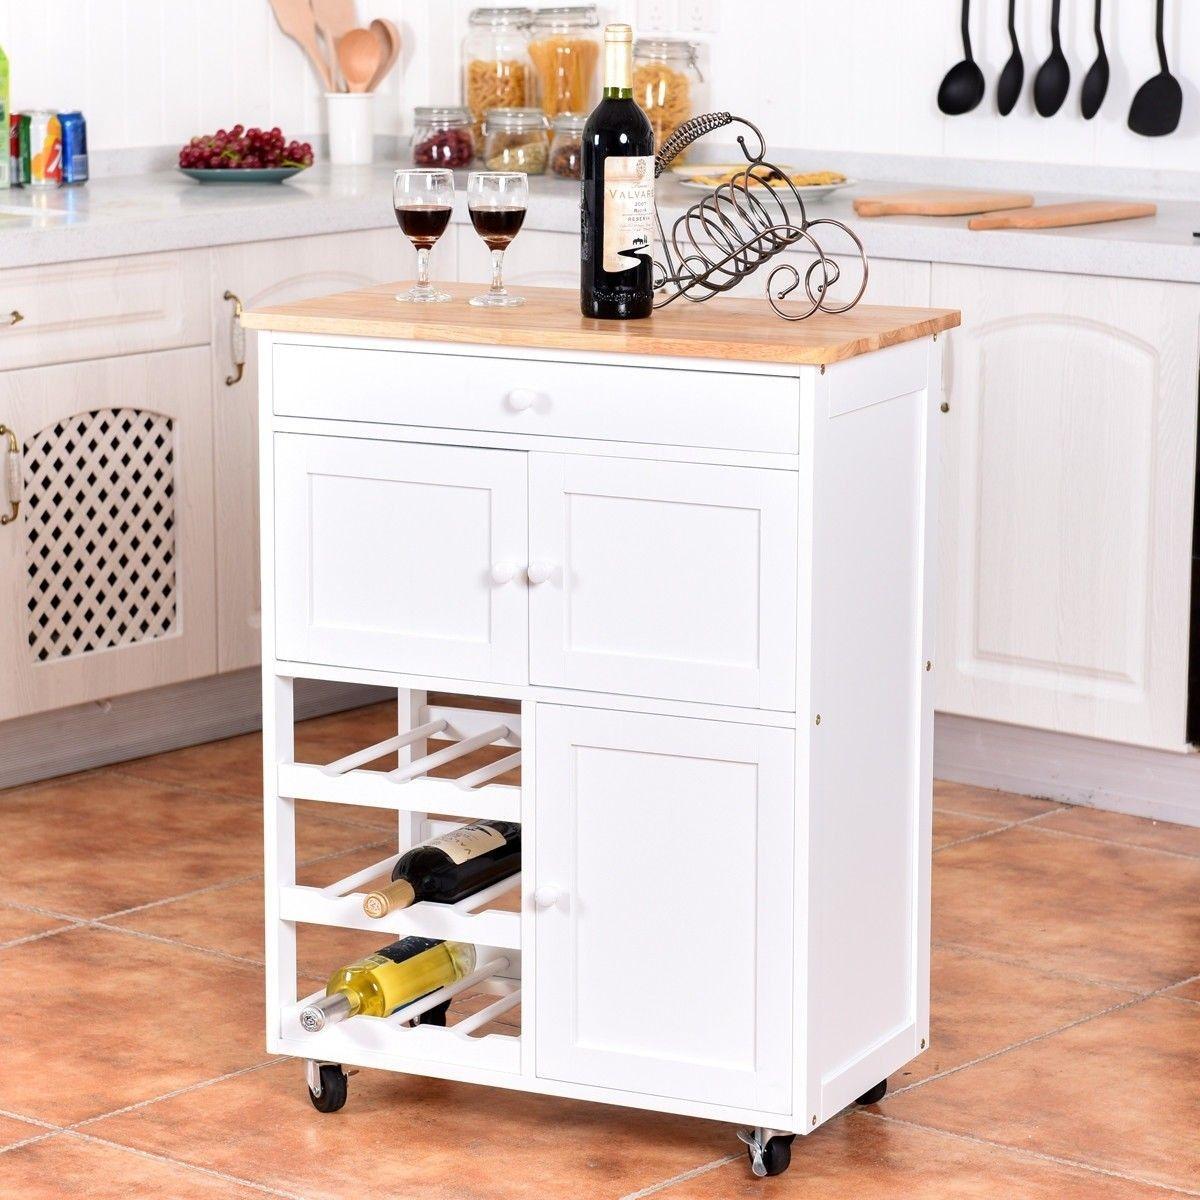 Modern Rolling Storage Kitchen Cart with Drawer $11.11 + Free